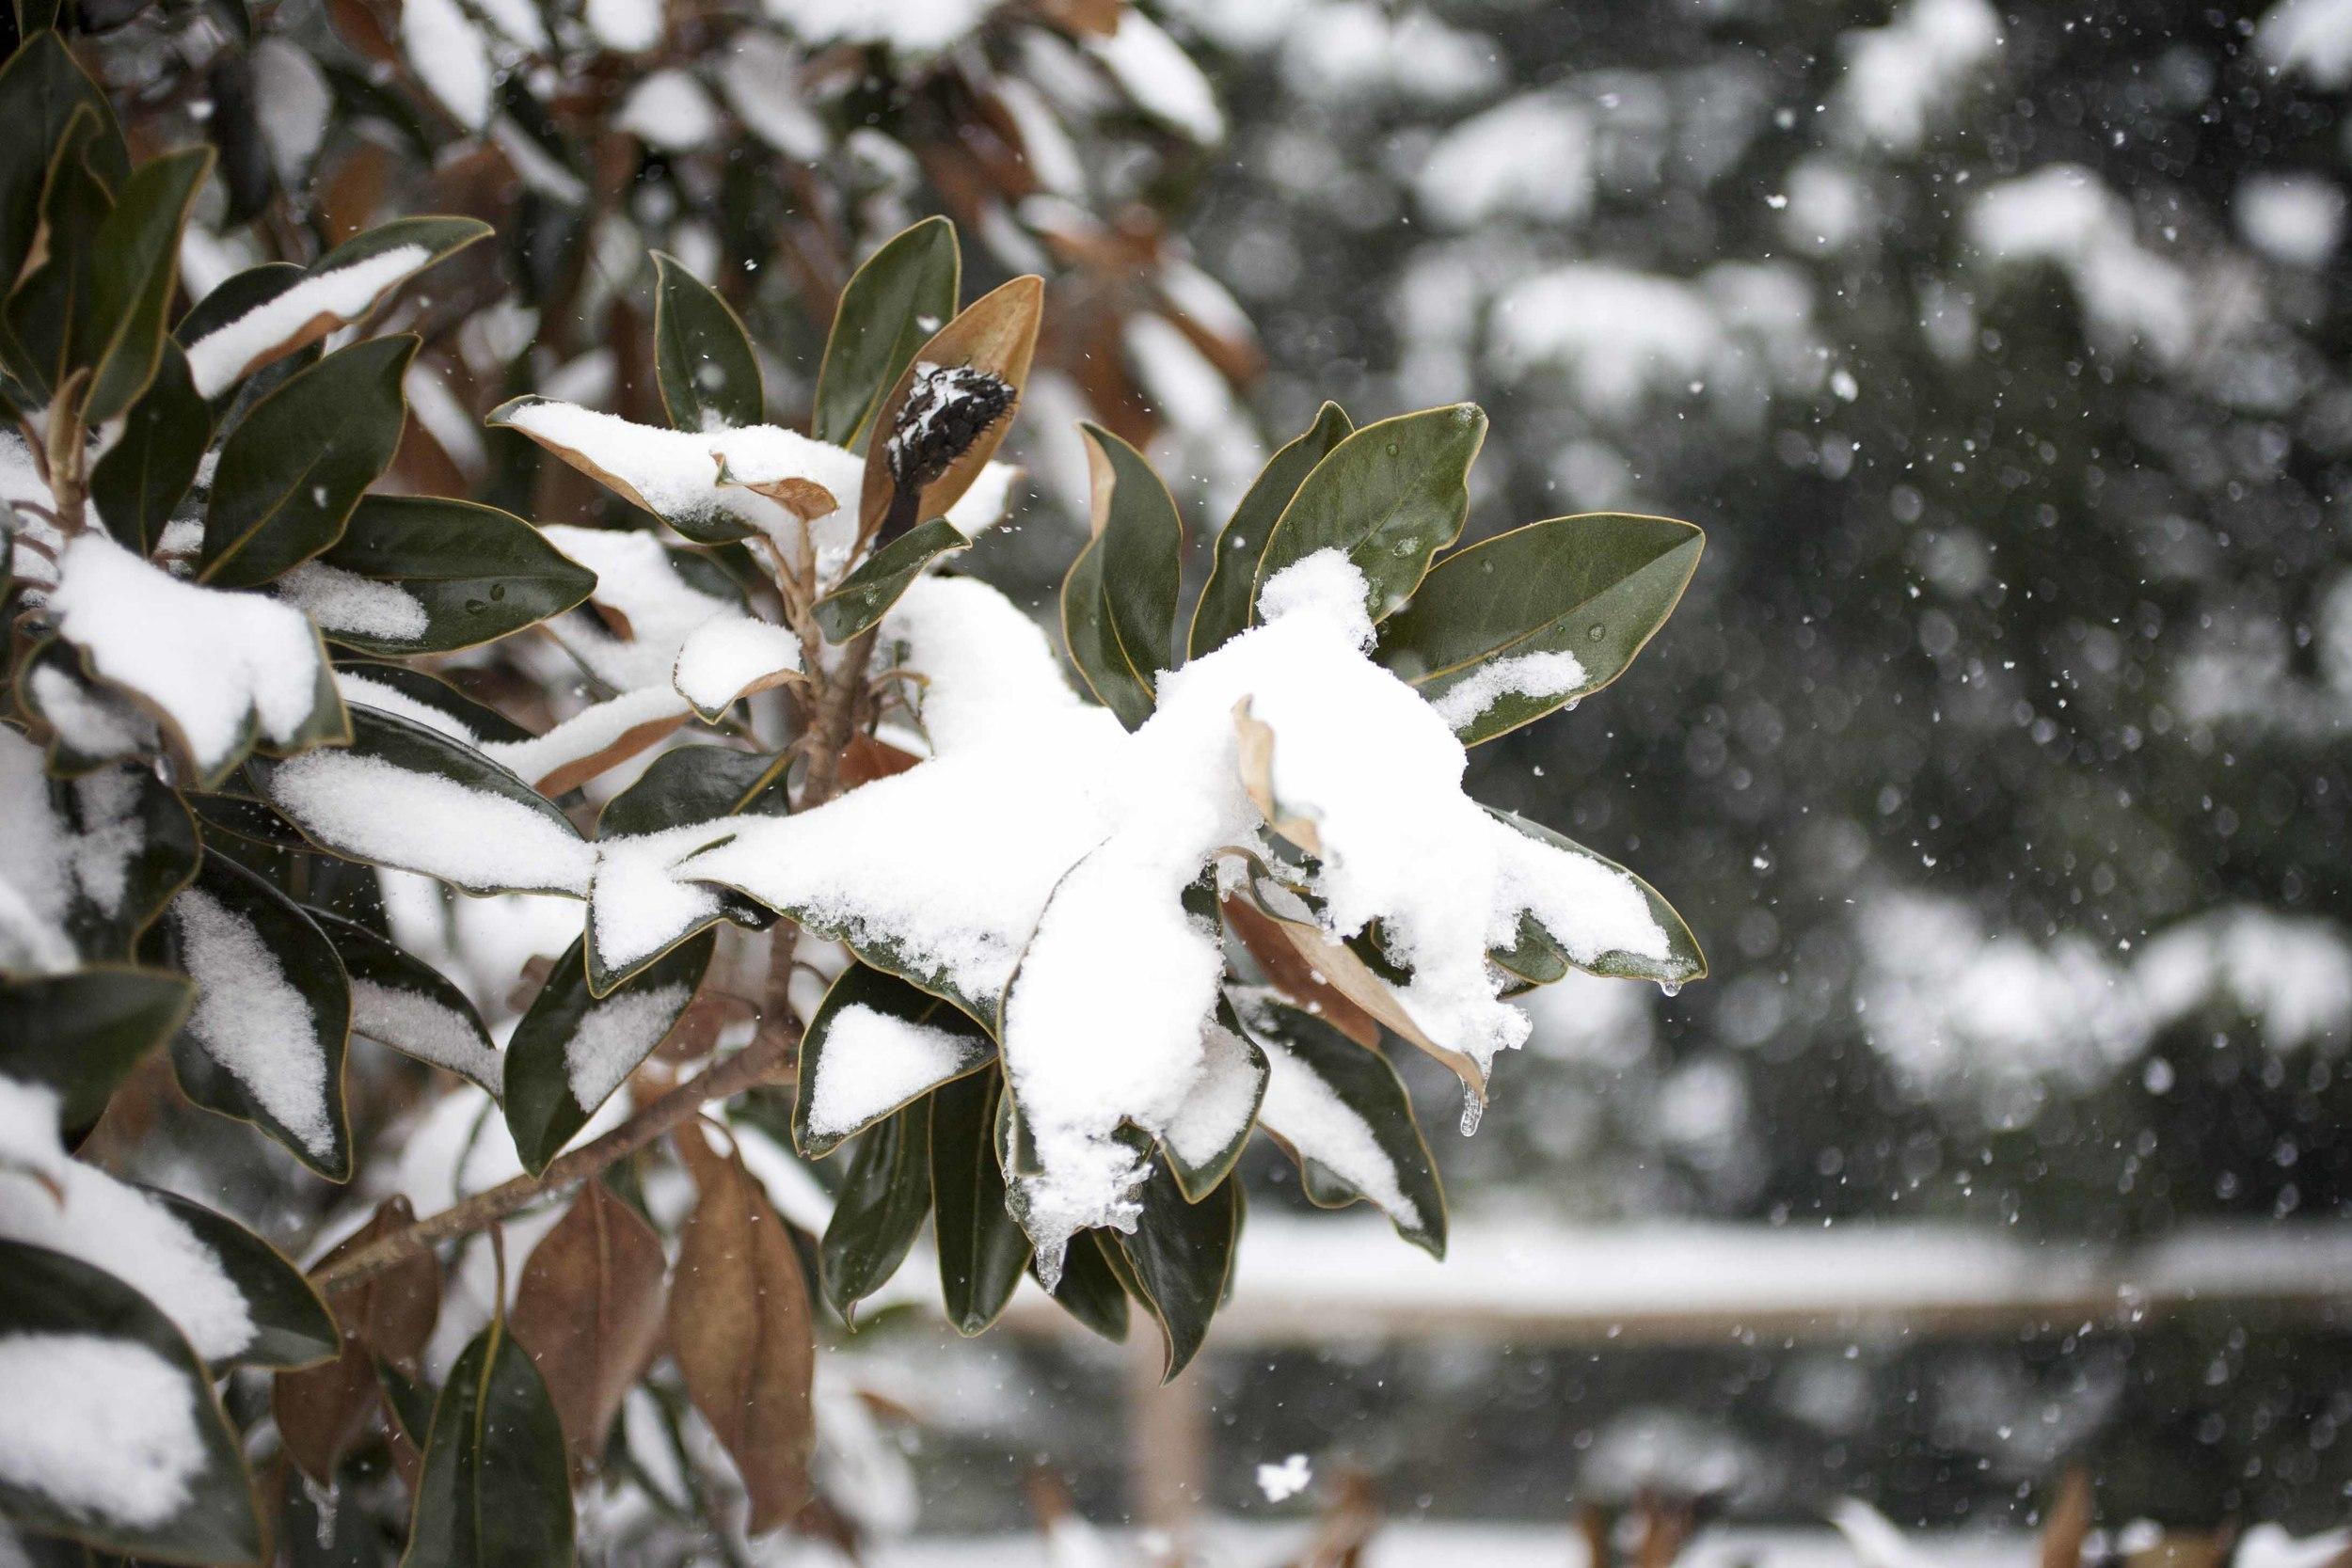 SNOW DAY ARIANA CLARE_11.jpg